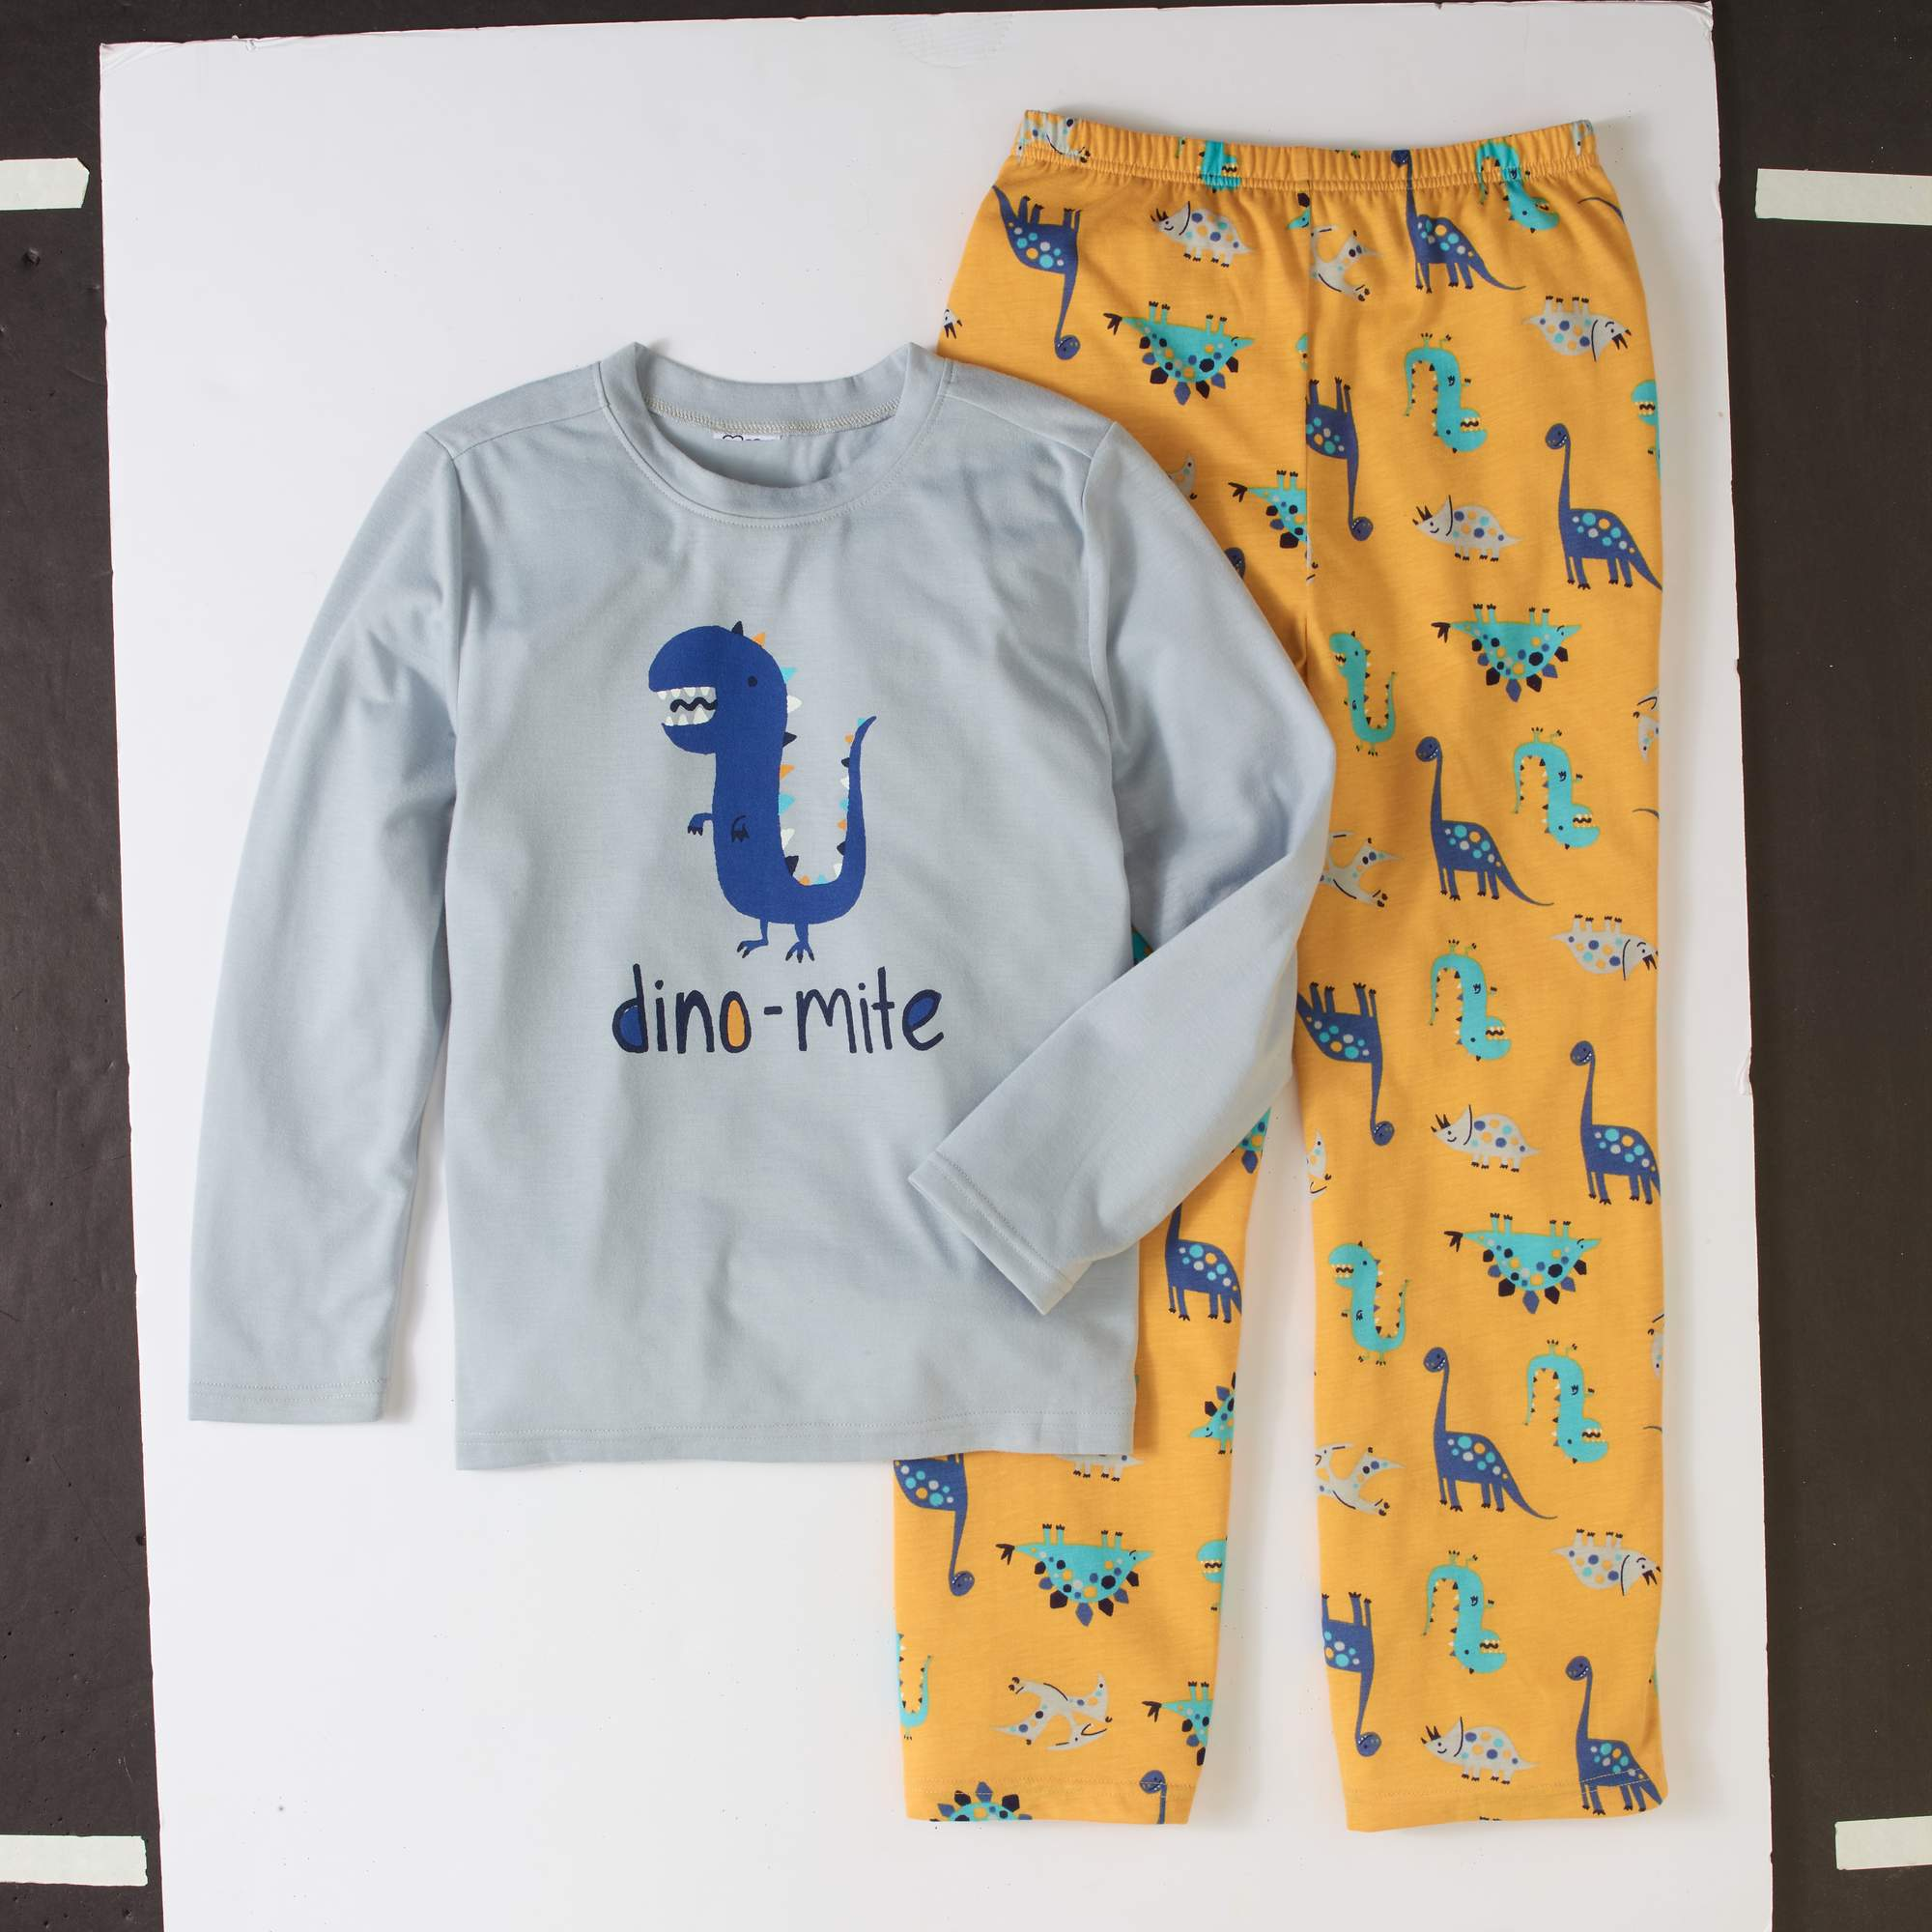 Toast & Jammies Boys' Brushed Jersey Long Sleeve Top and Pants 2 - Piece Sleepwear Set